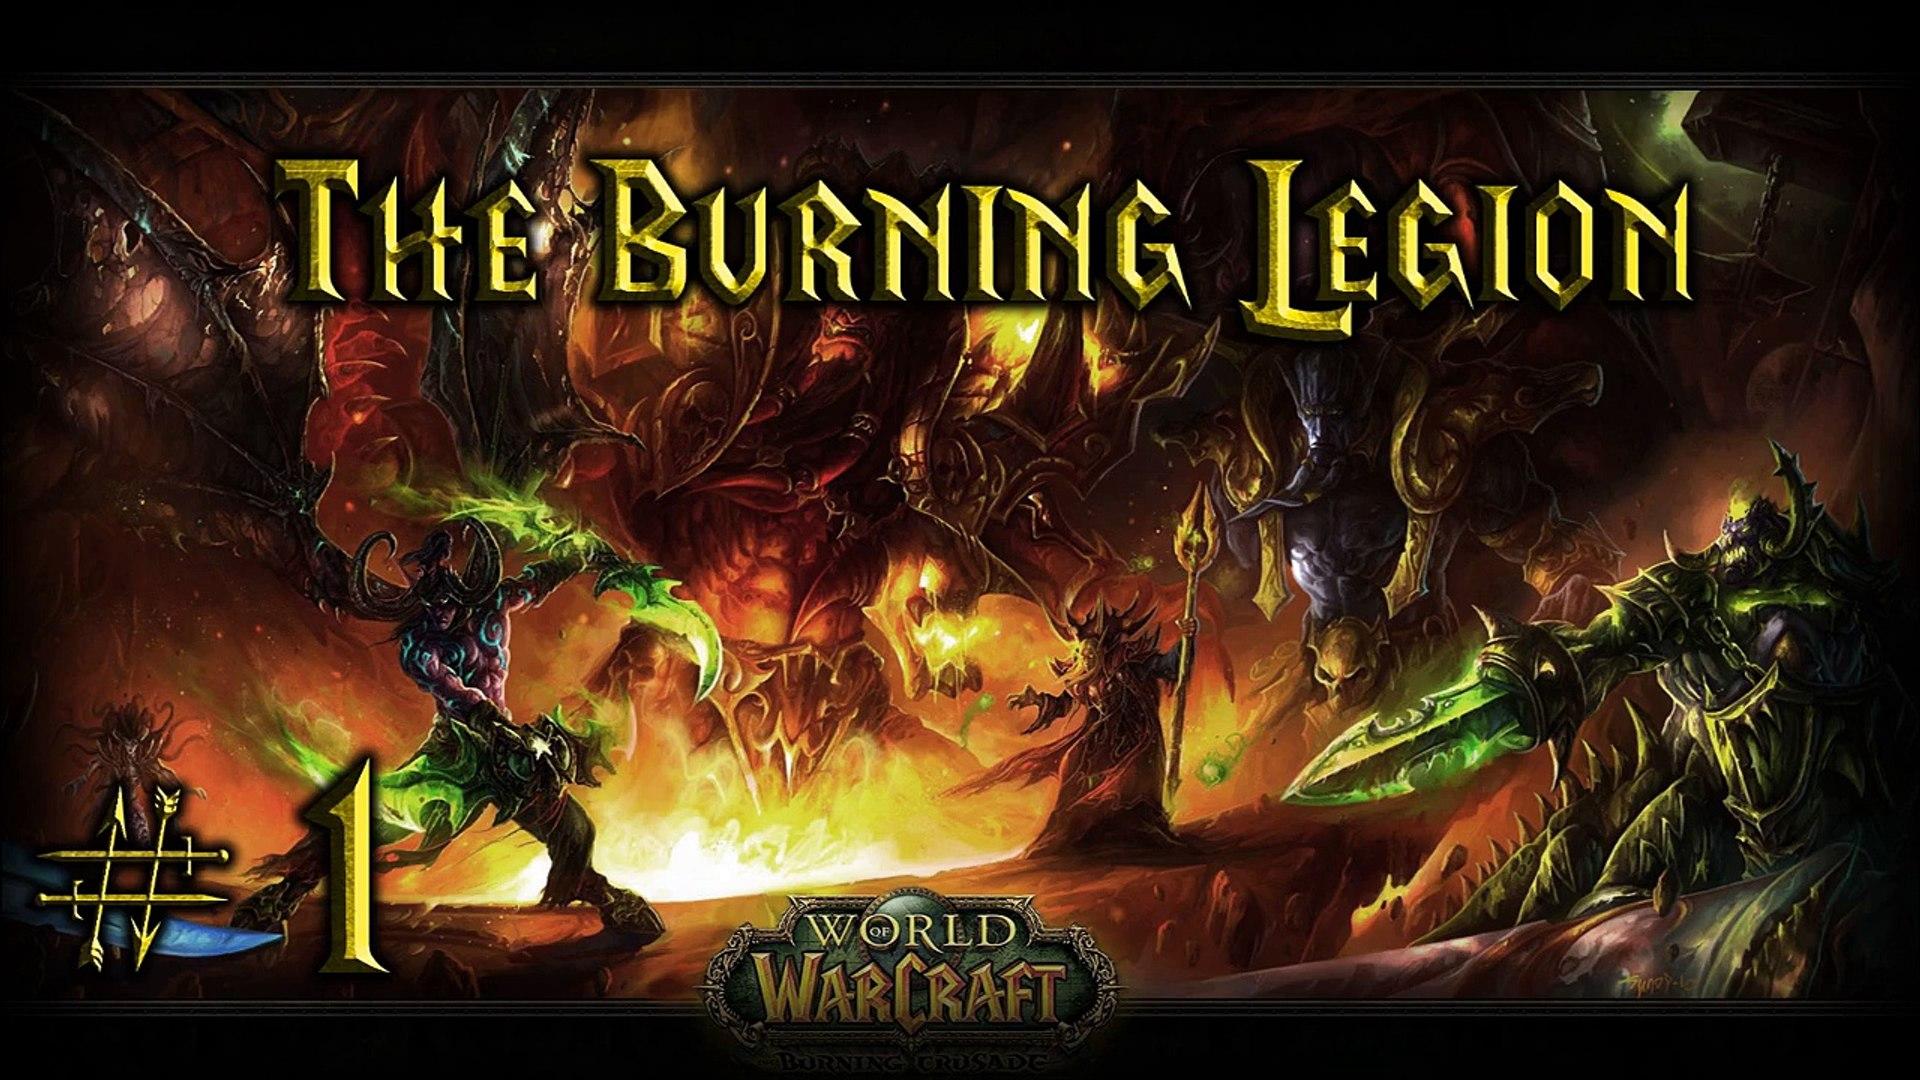 World Of Warcraft The Burning Crusade Ost Track 01 The Burning